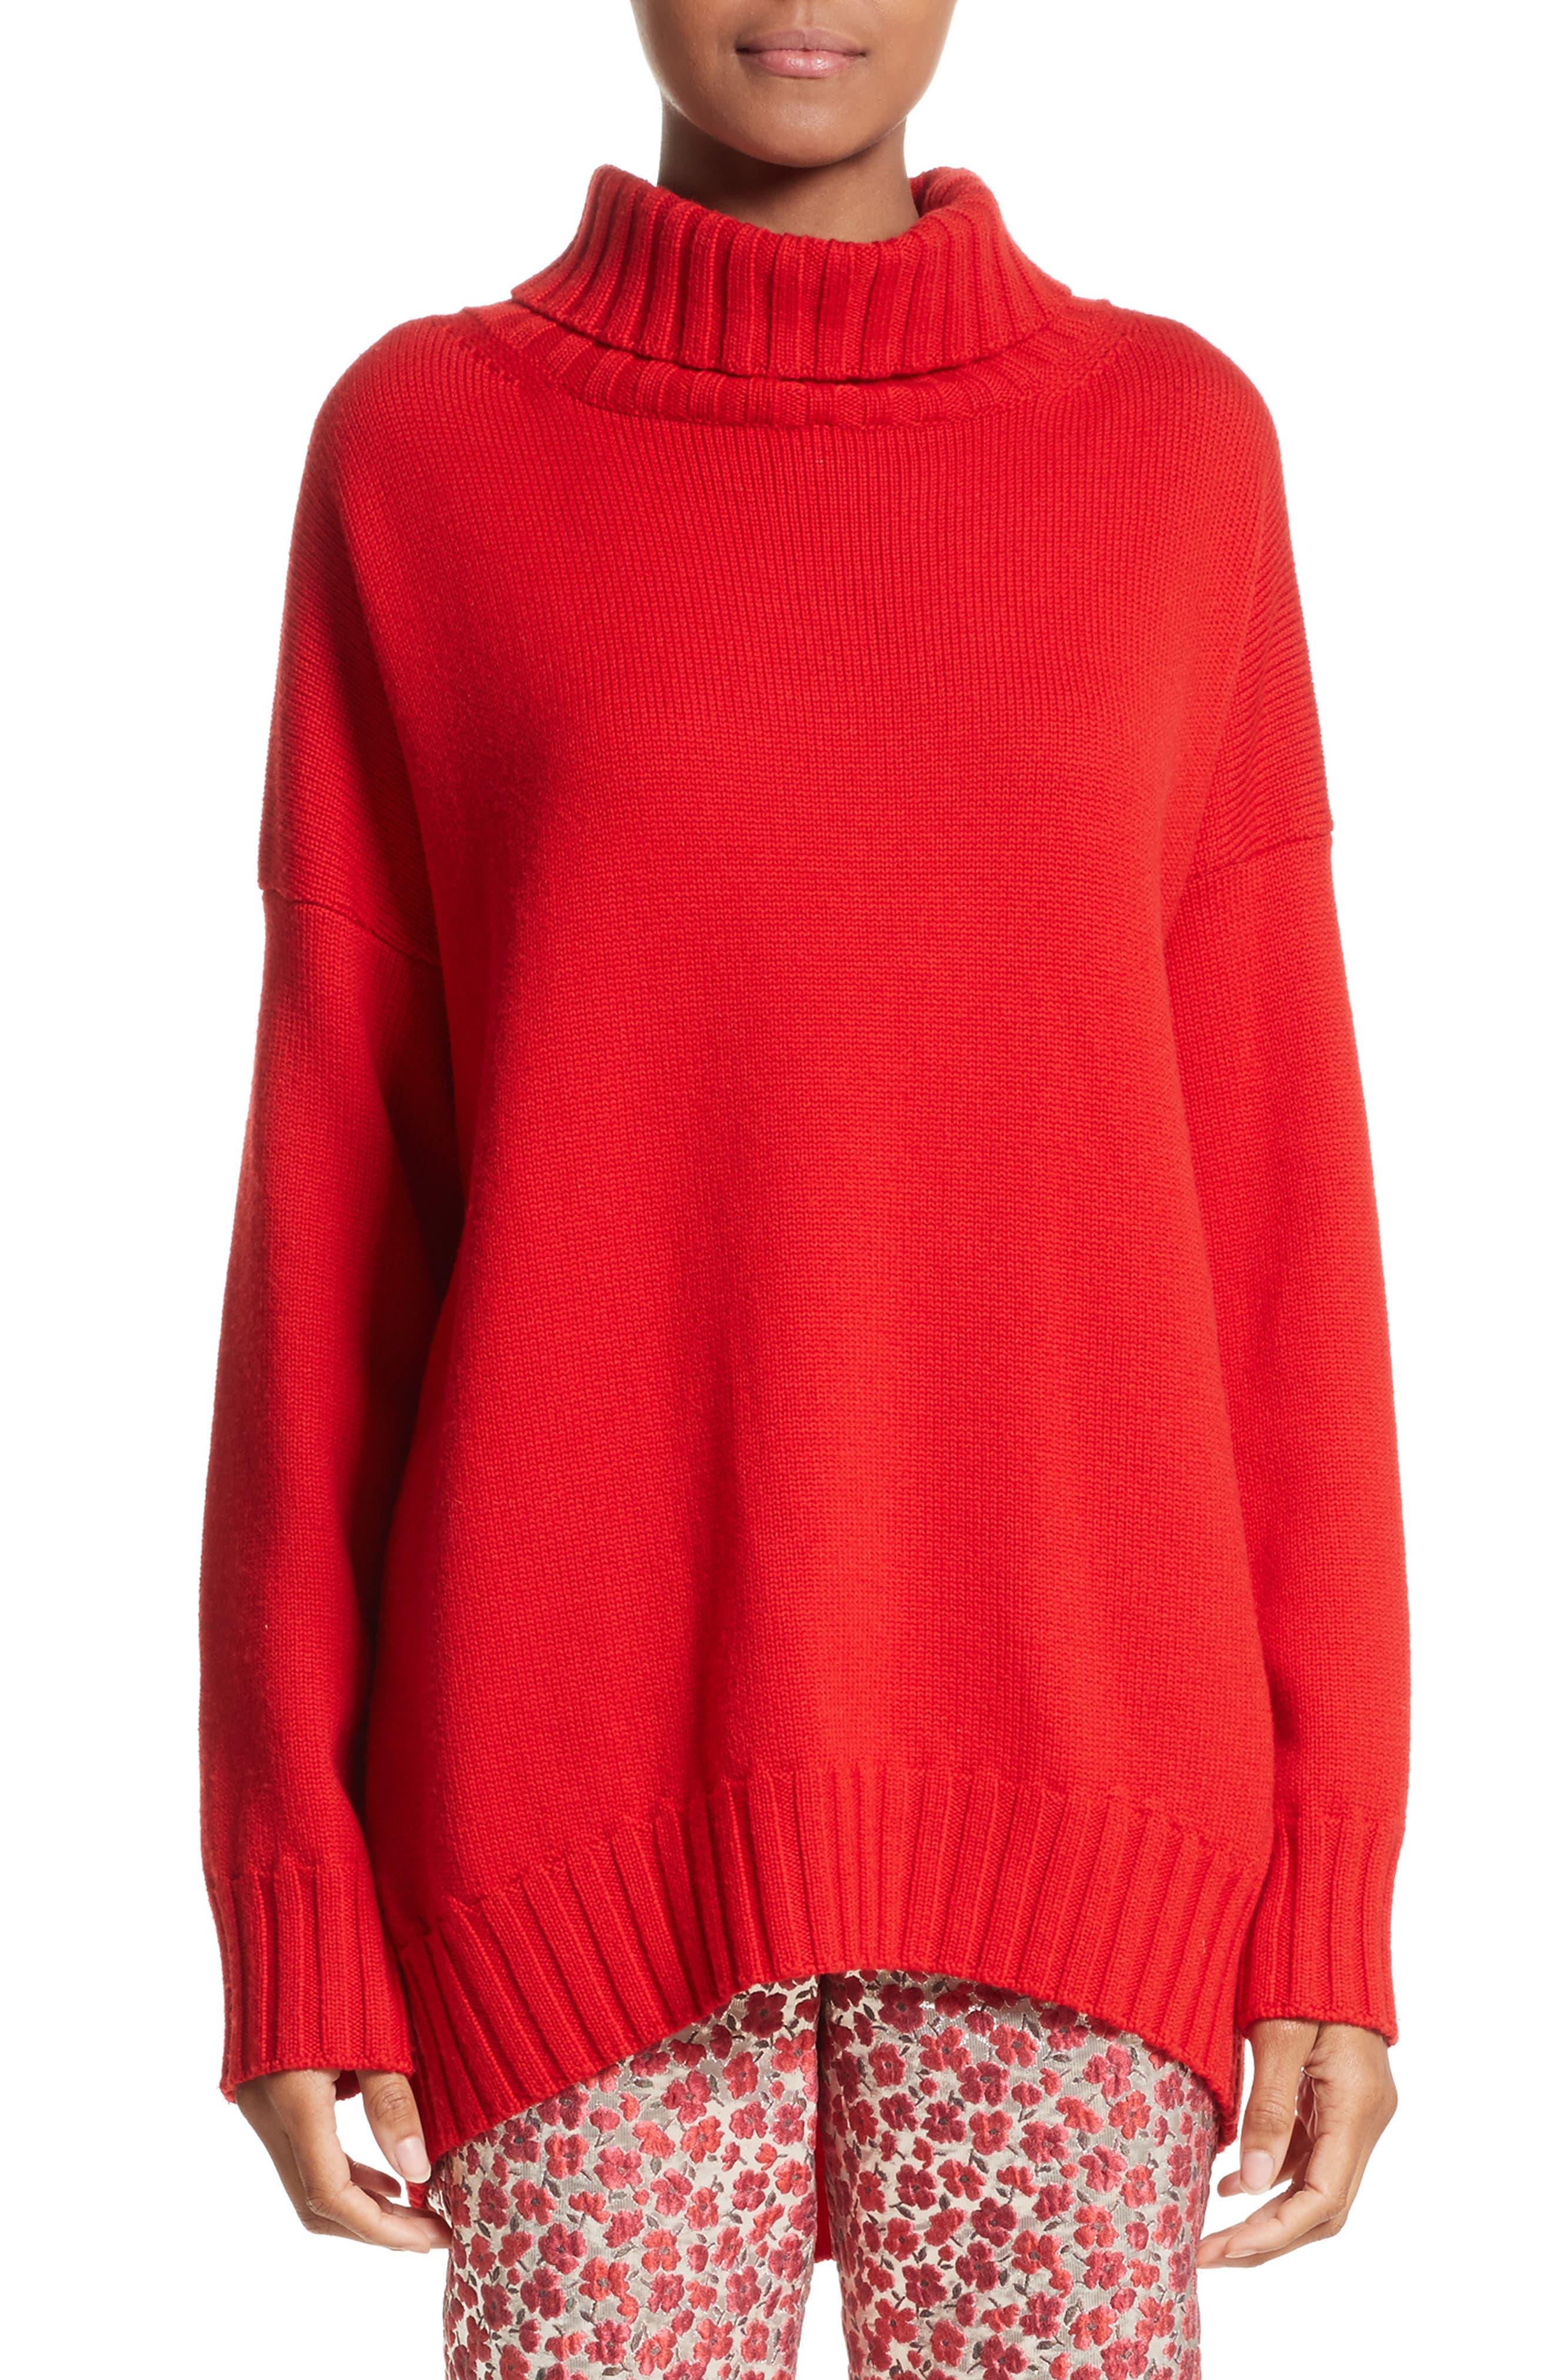 Alternate Image 1 Selected - Oscar de la Renta Virgin Wool Turtleneck Sweater